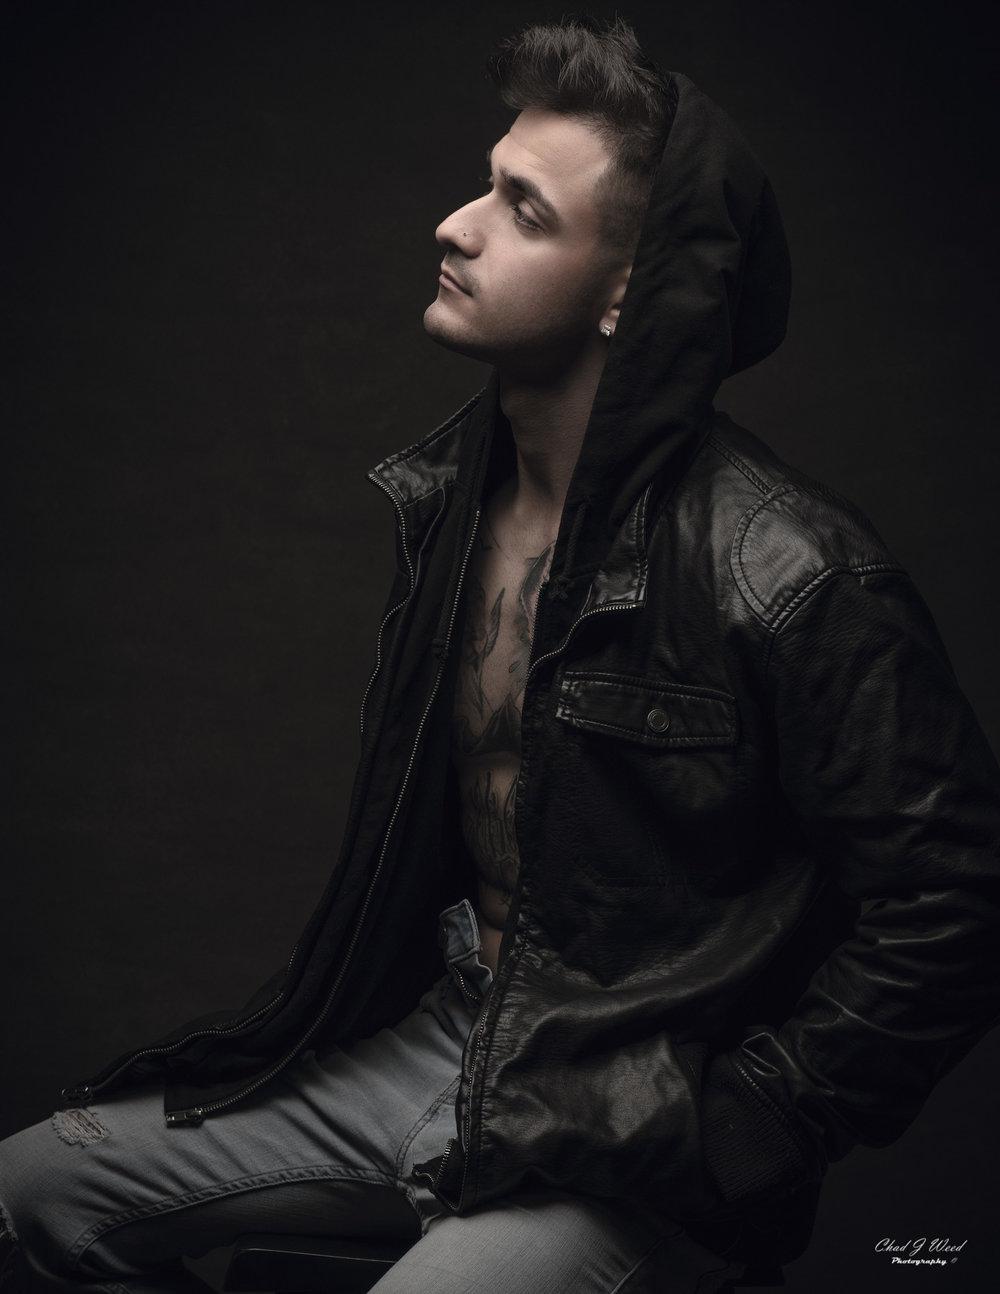 Mesa Arizona Portrait Photographer Chad Weed with Fashion Model Isaac 1